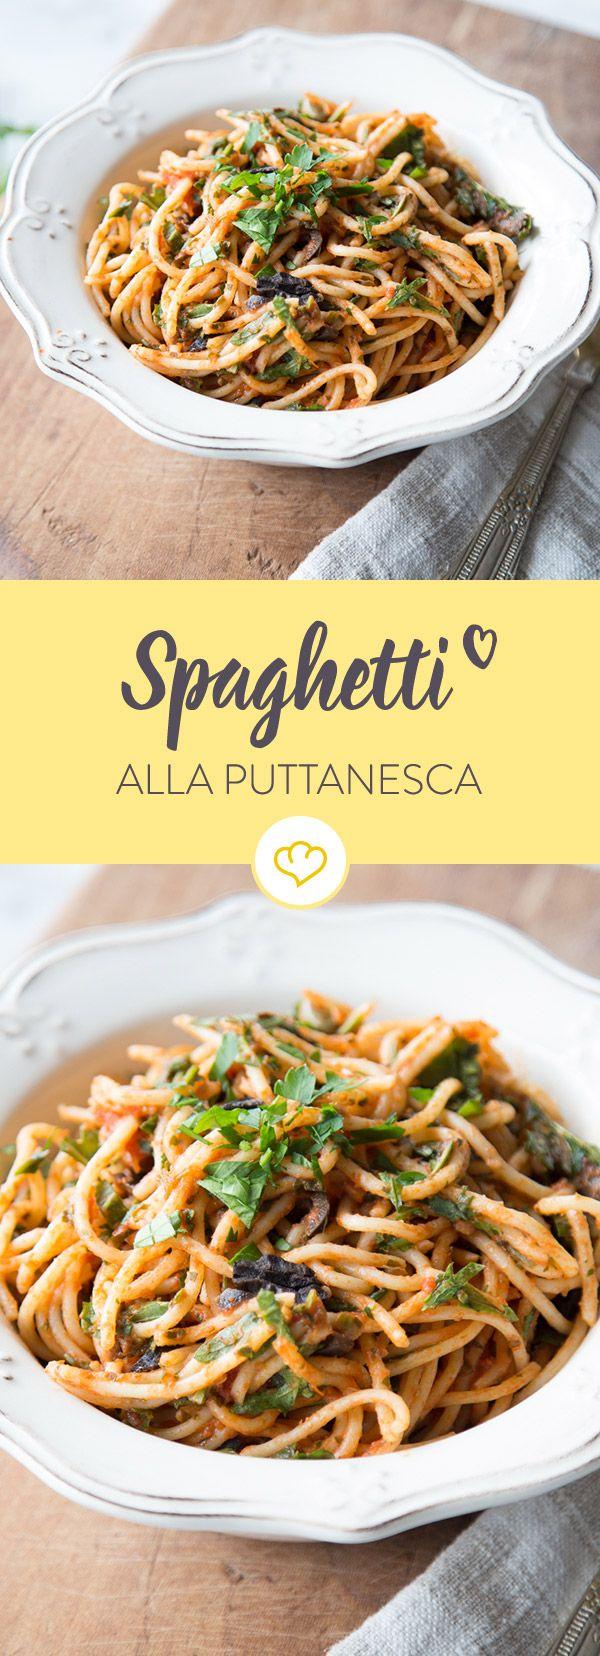 Photo of Spaghetti alla puttanesca: Pastaliebe aus Süditalien